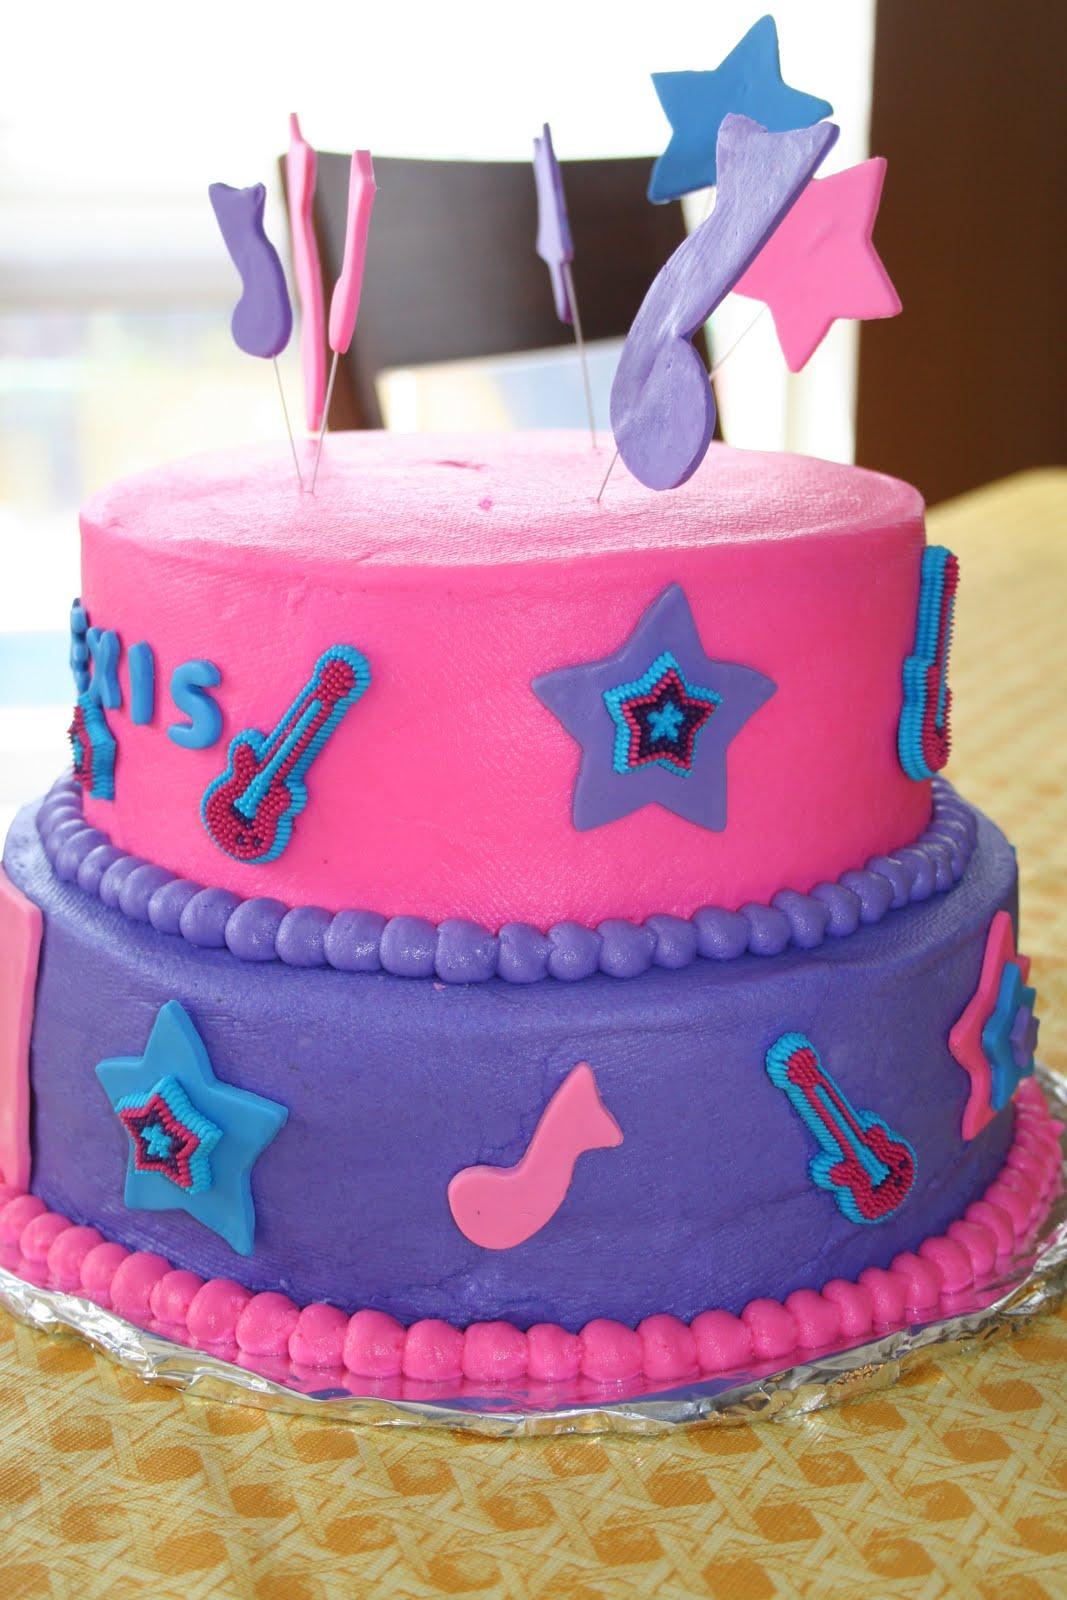 Rachels Creative Cakes My Daughters Rock Star Birthday Cake